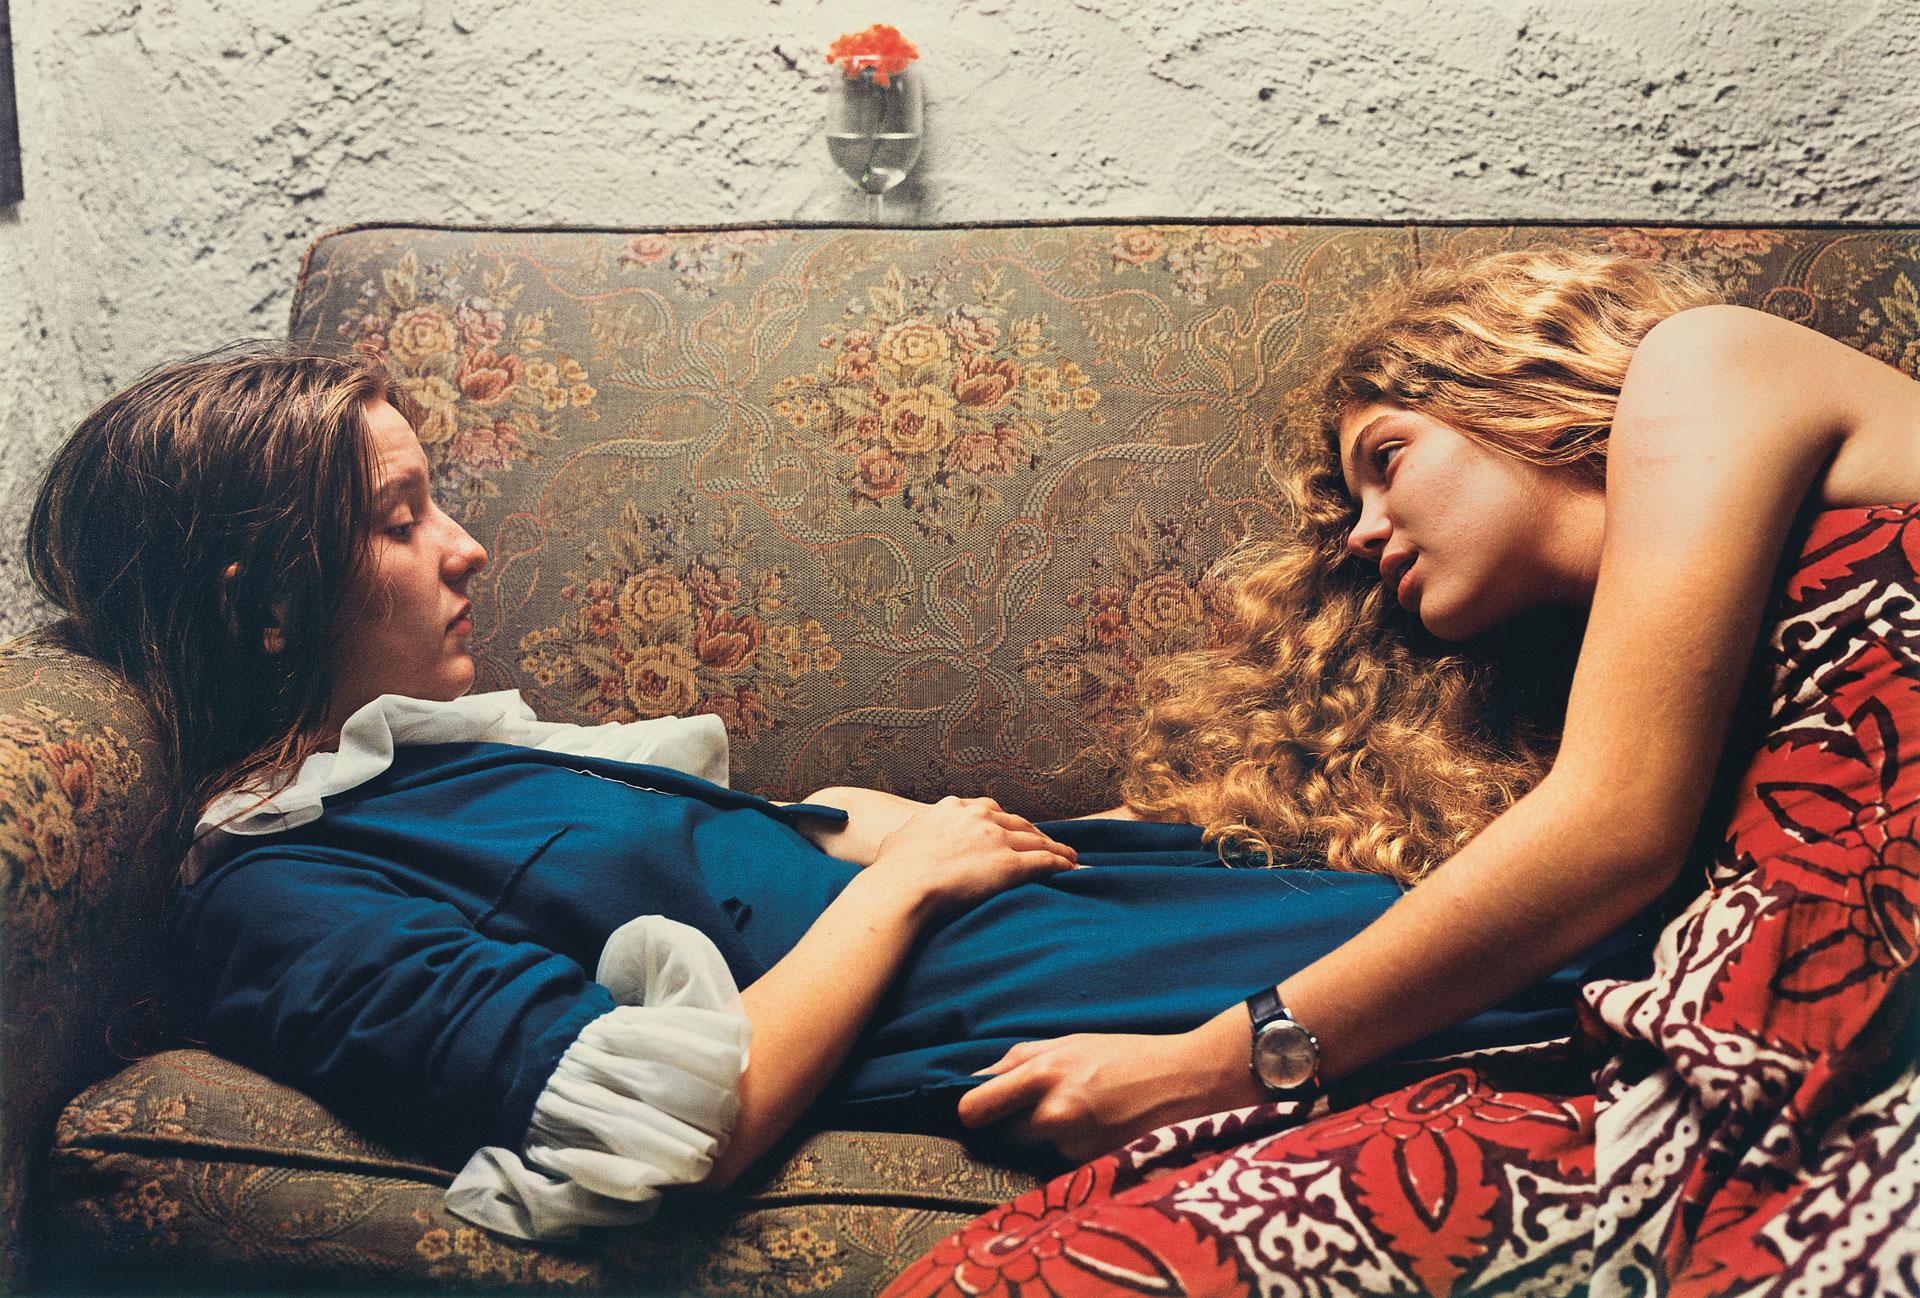 Untitled, 1974, William Eggleston portraits